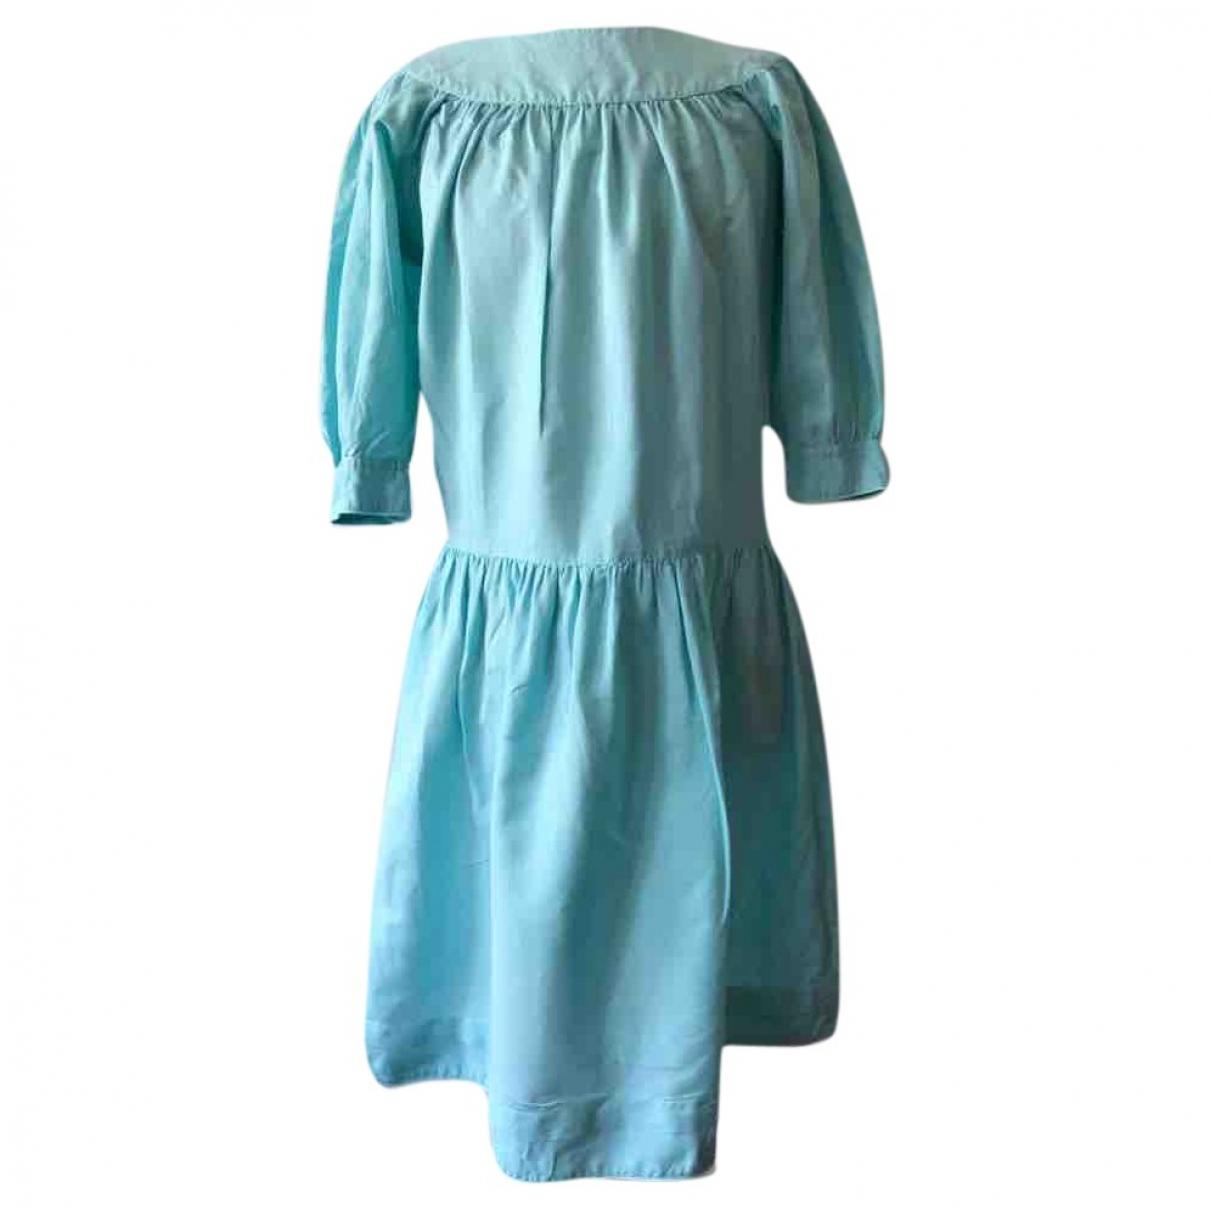 Kenzo \N Cotton dress for Women M International